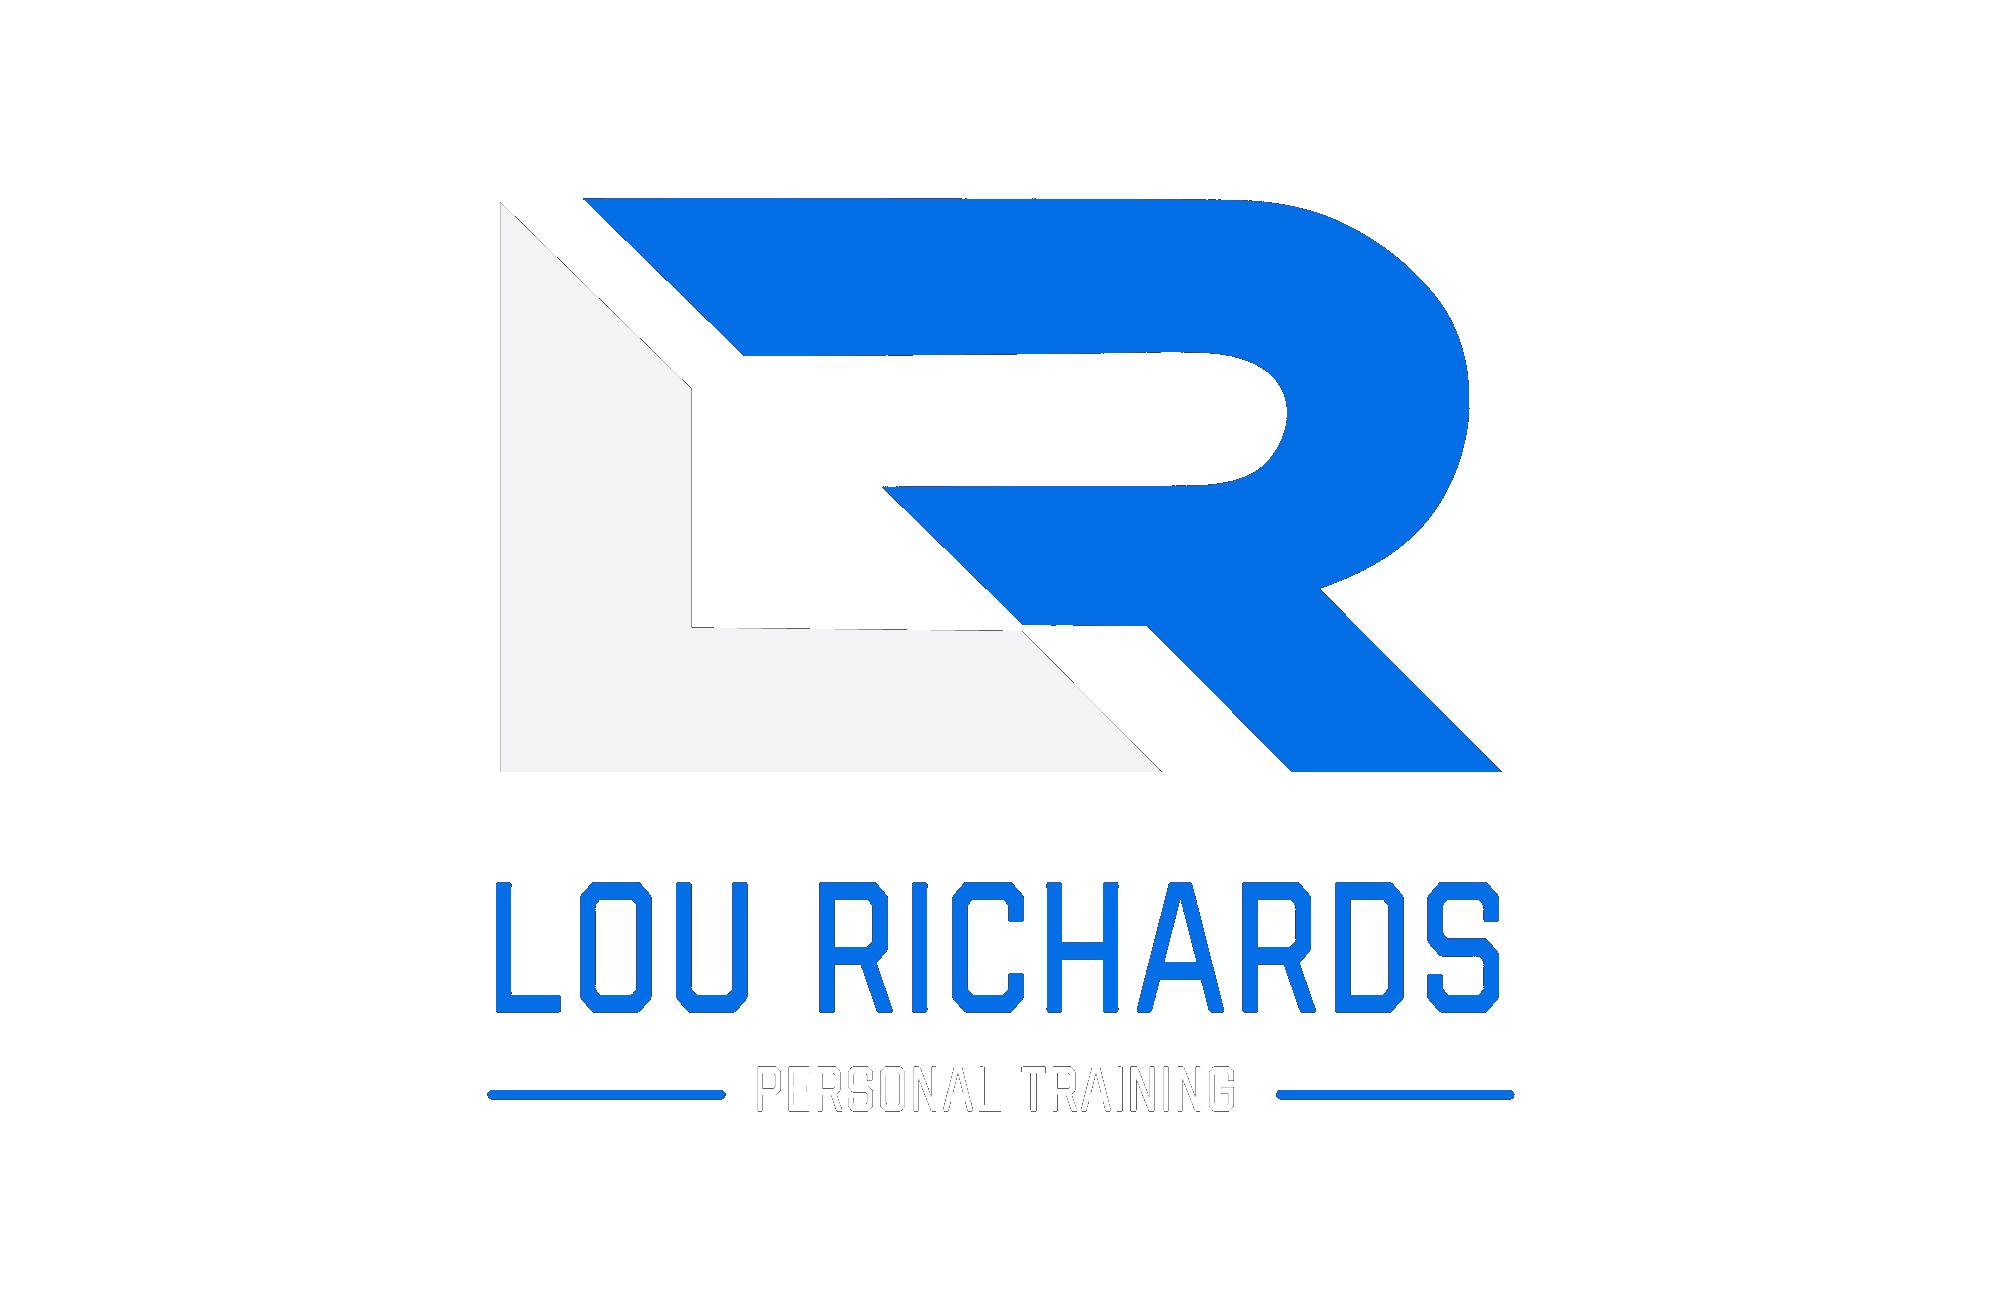 Lou Richards Personal Training